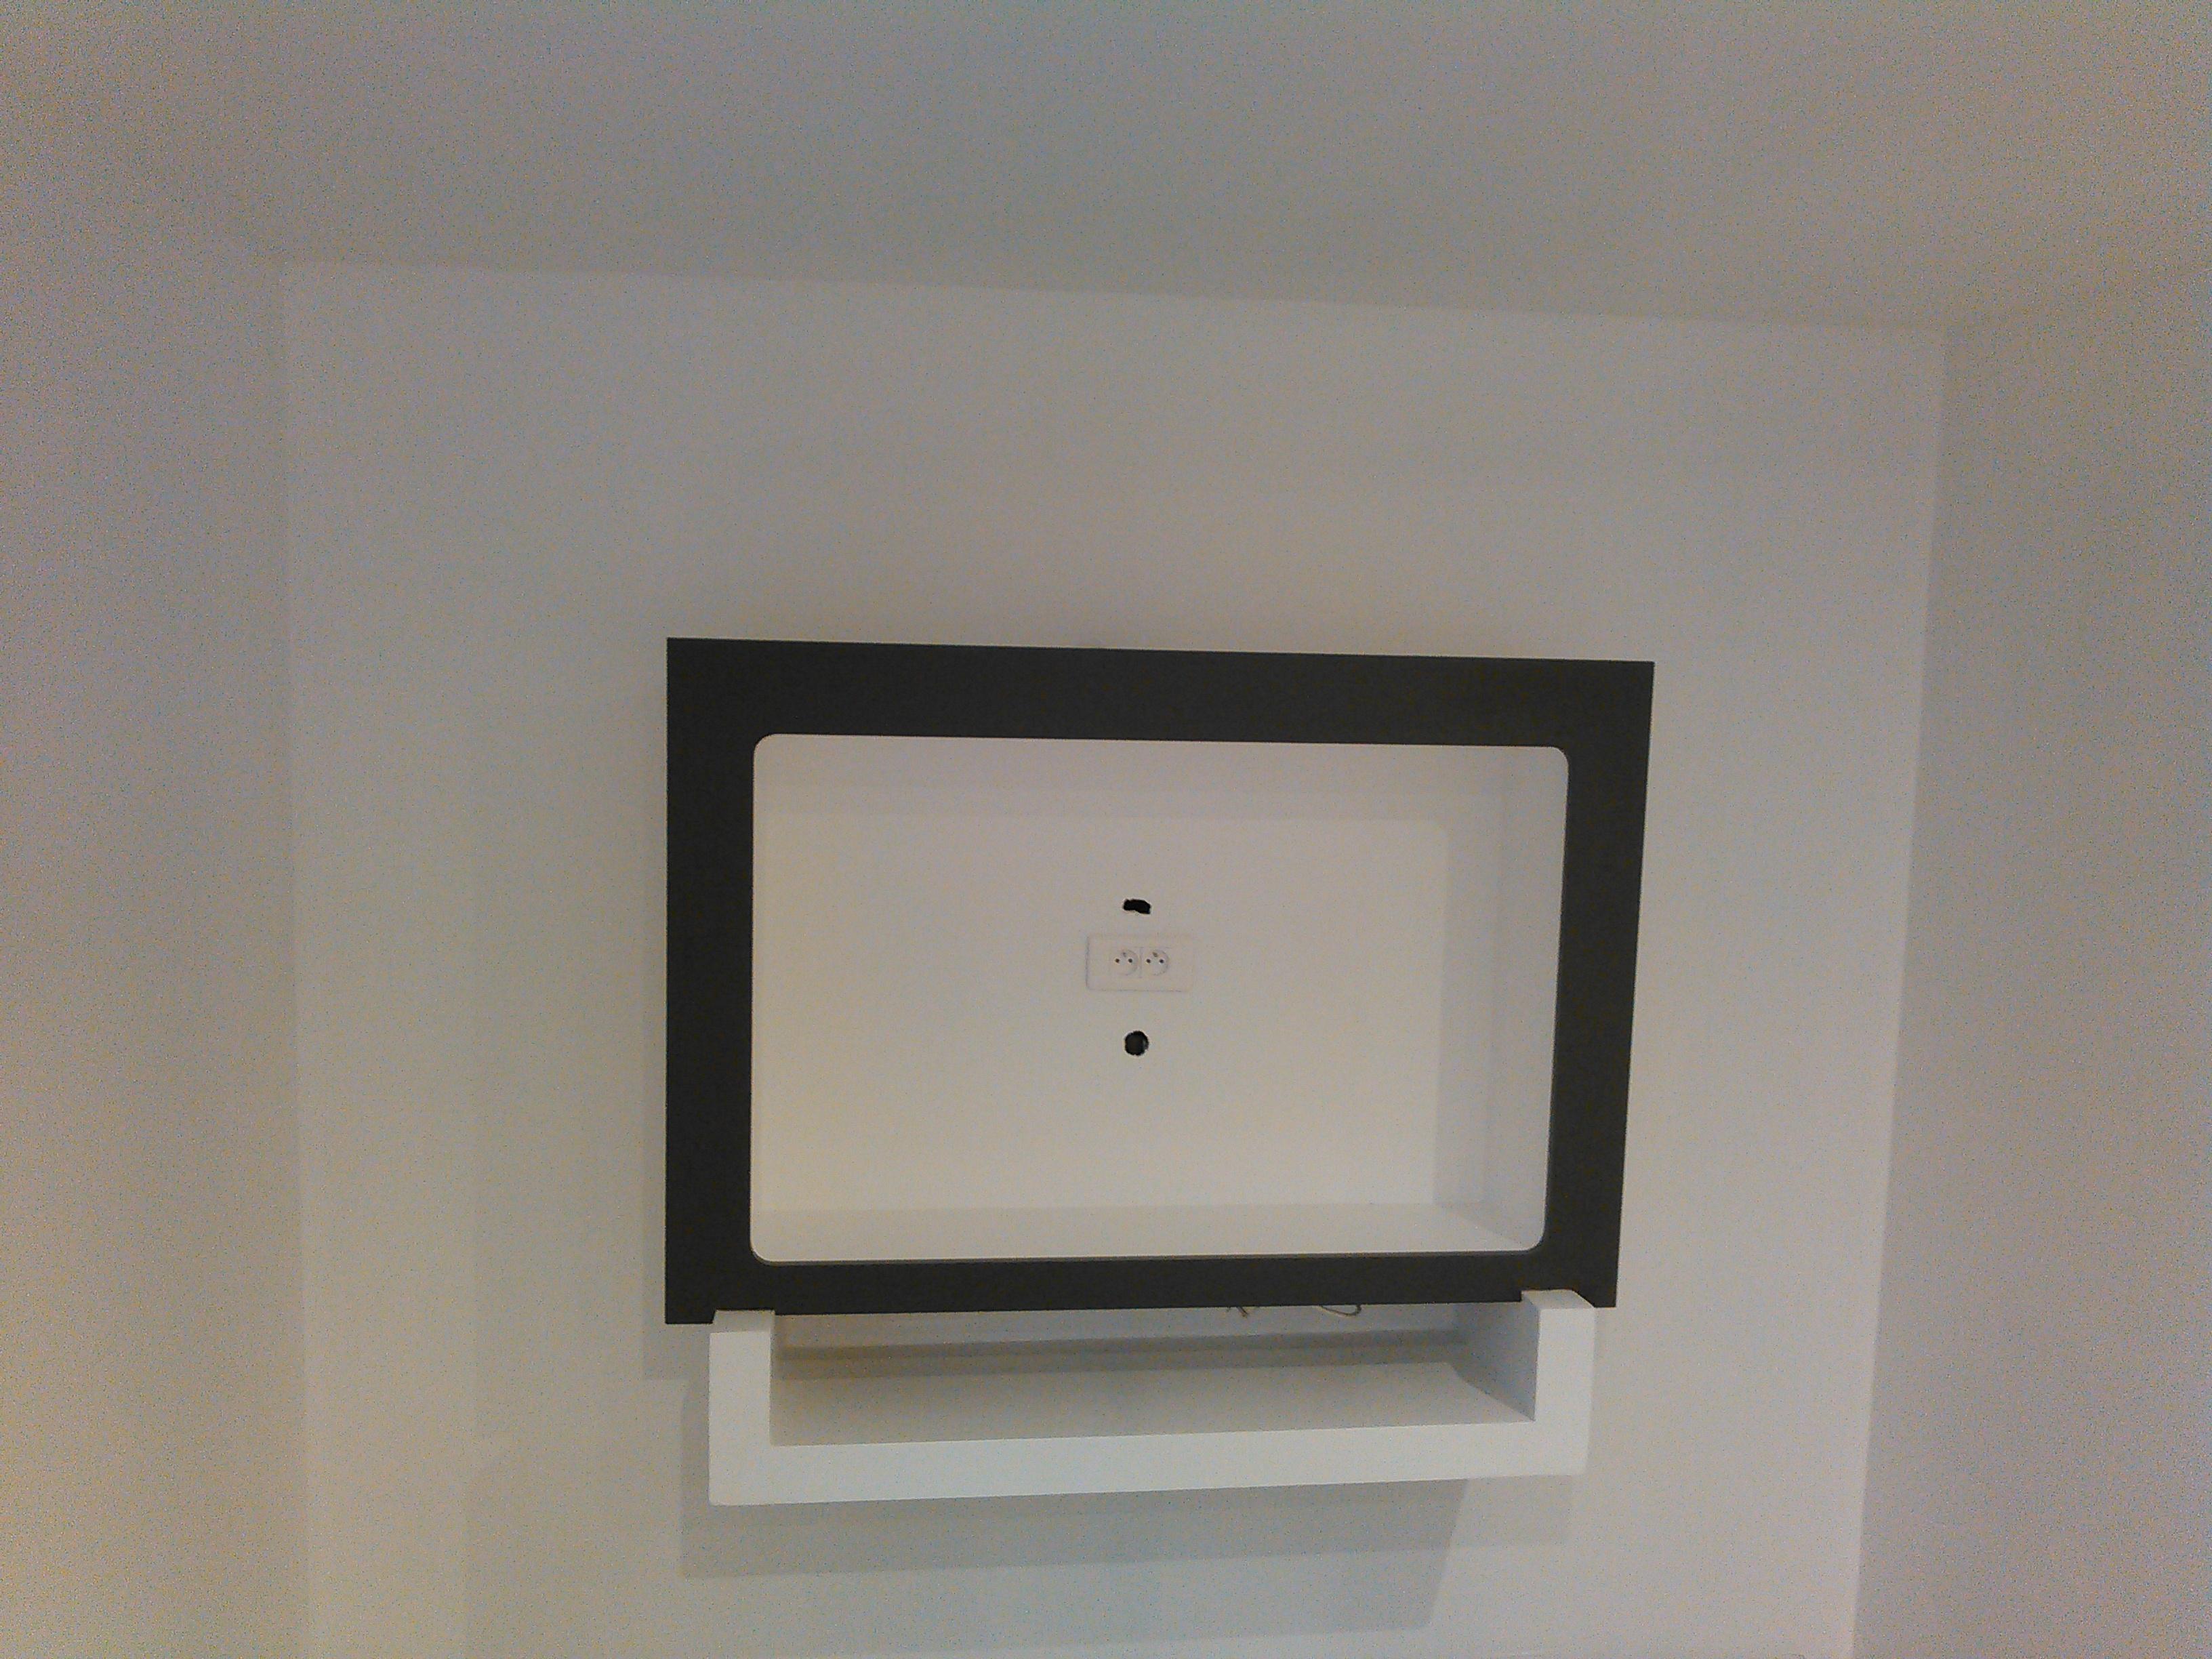 un meuble tv suspendu en placo